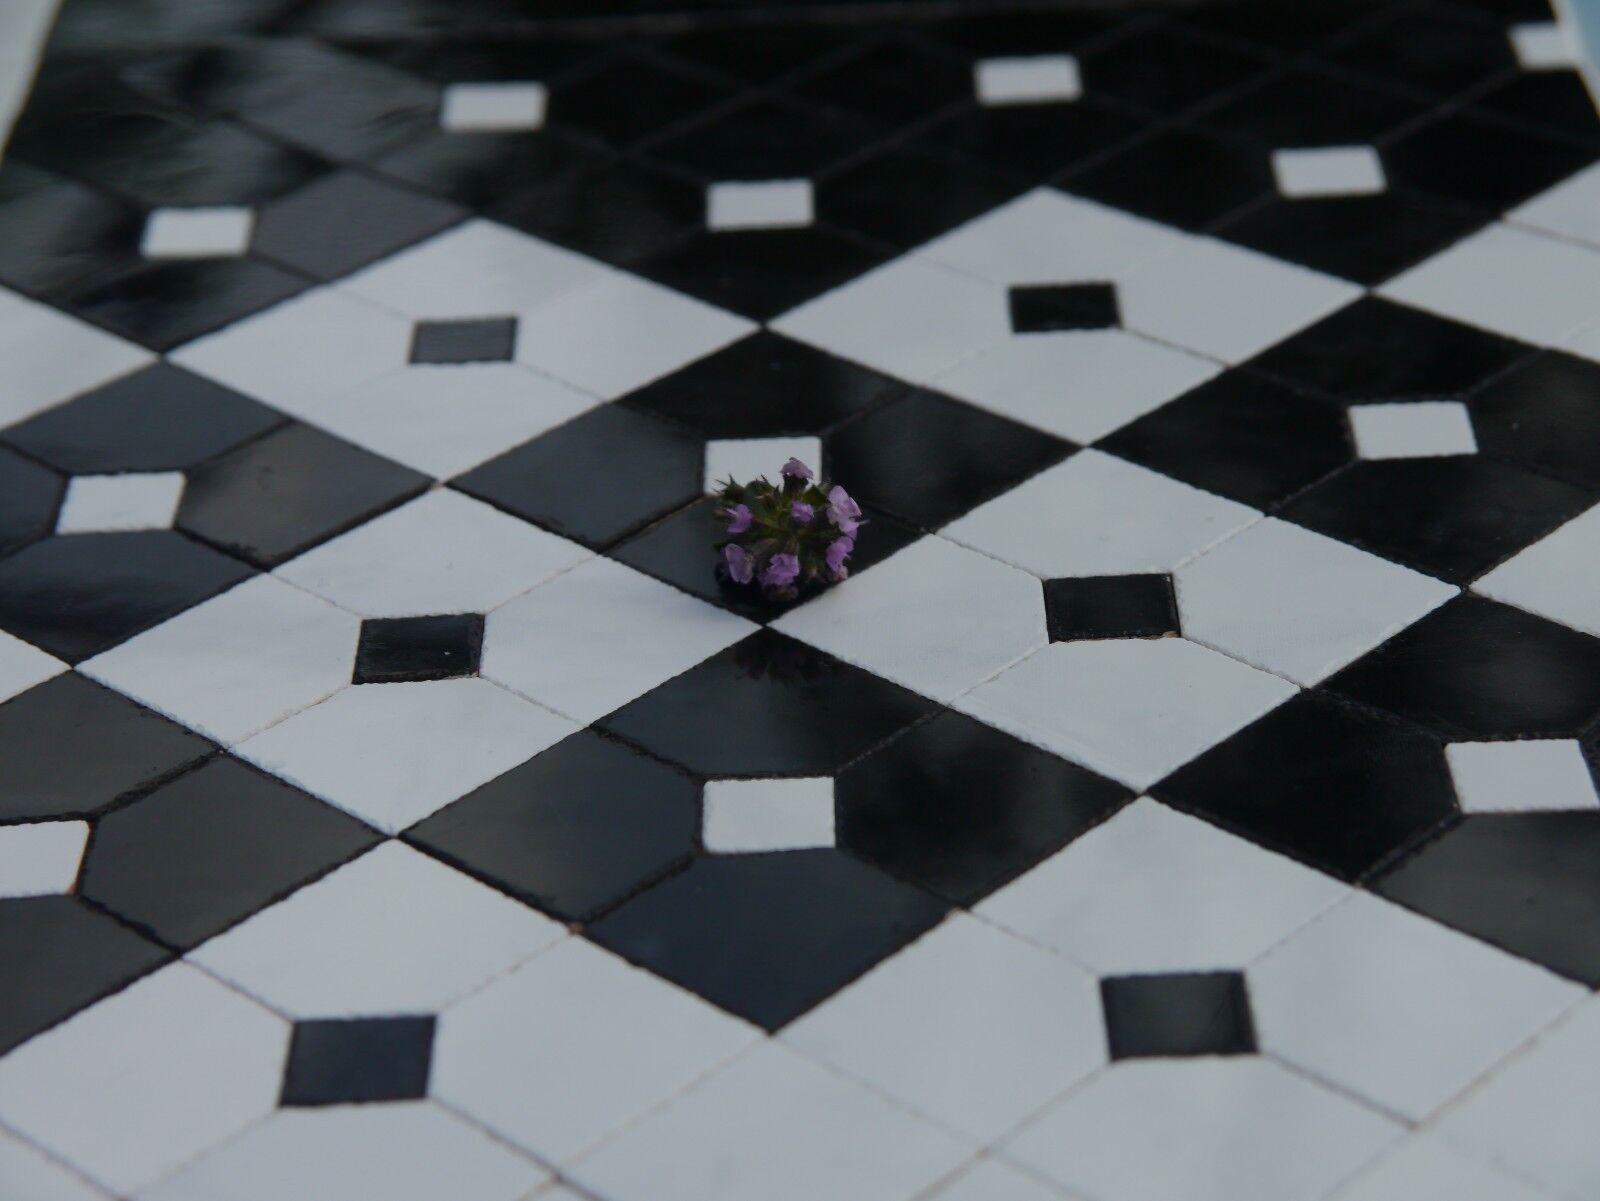 18 sq   Luxury Decorative Ceramic Dolls House Floor Tiles